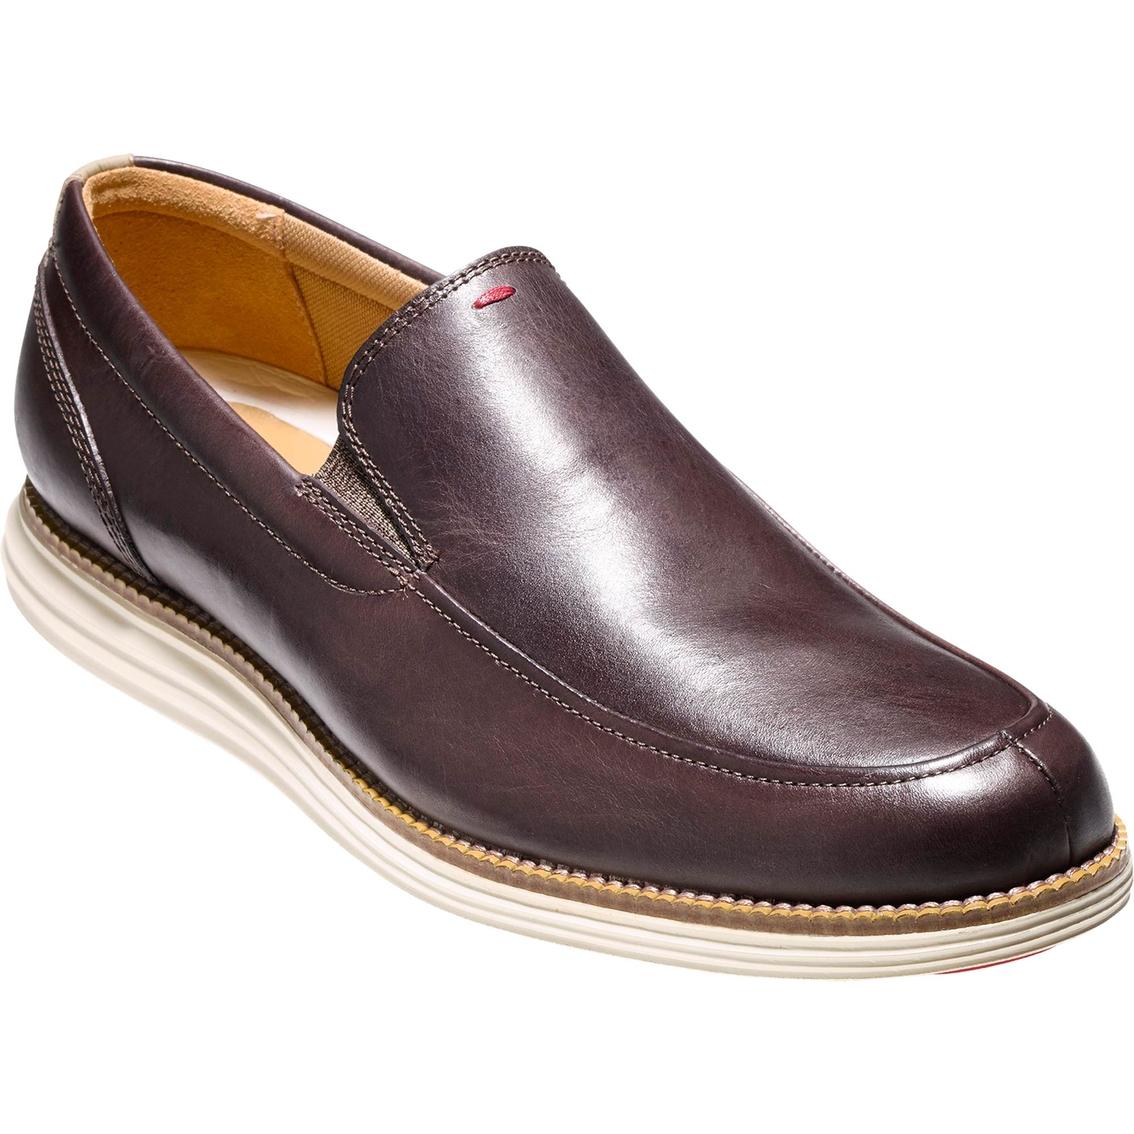 0d95489dce Cole Haan Original Grand Venetian Slip On Casual Shoes | Dress ...